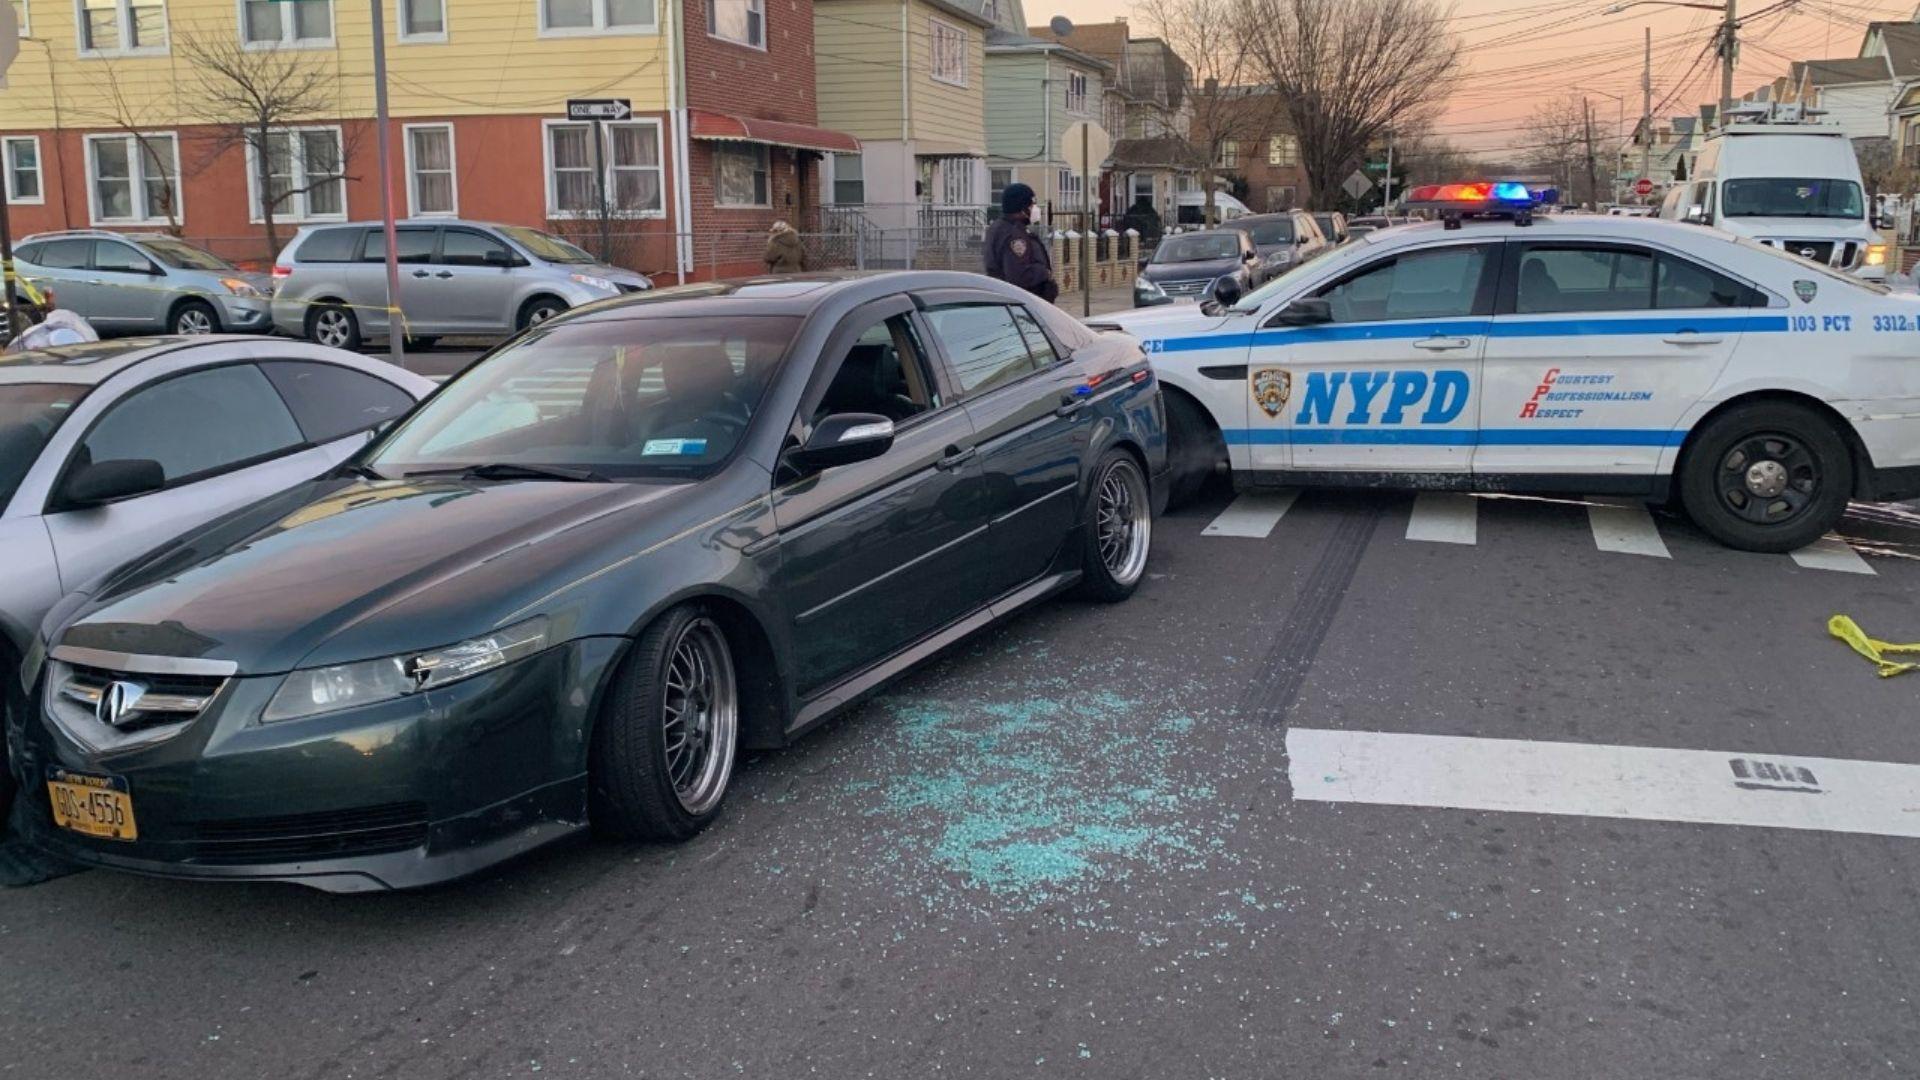 Officer shoots man after stolen car pursuit in Queens